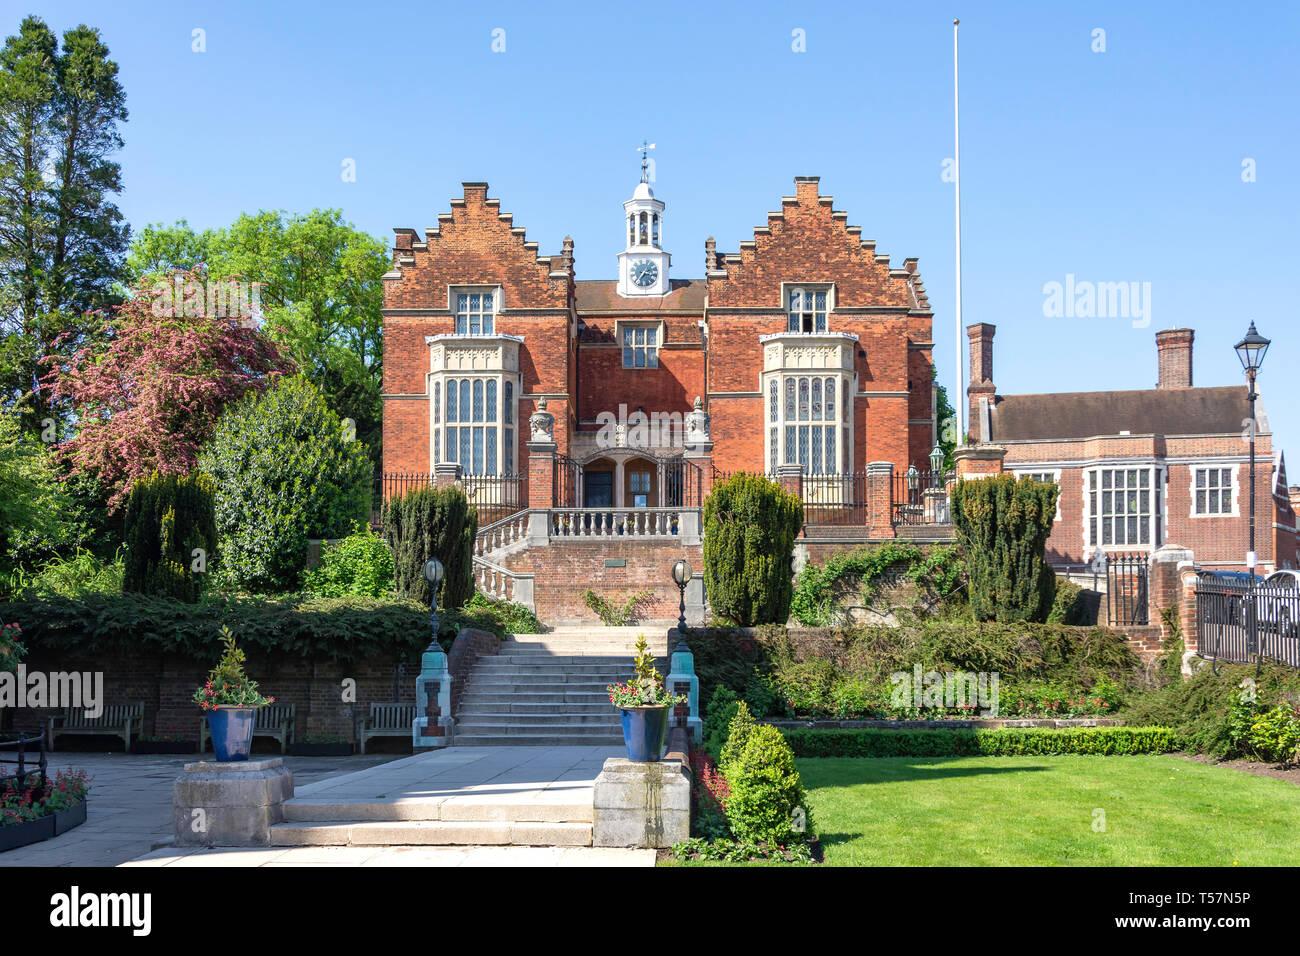 Old Speech Room Gallery, Harrow School, Harrow-on-the-Hill, London Borough of Harrow, Greater London, England, United Kingdom Stock Photo